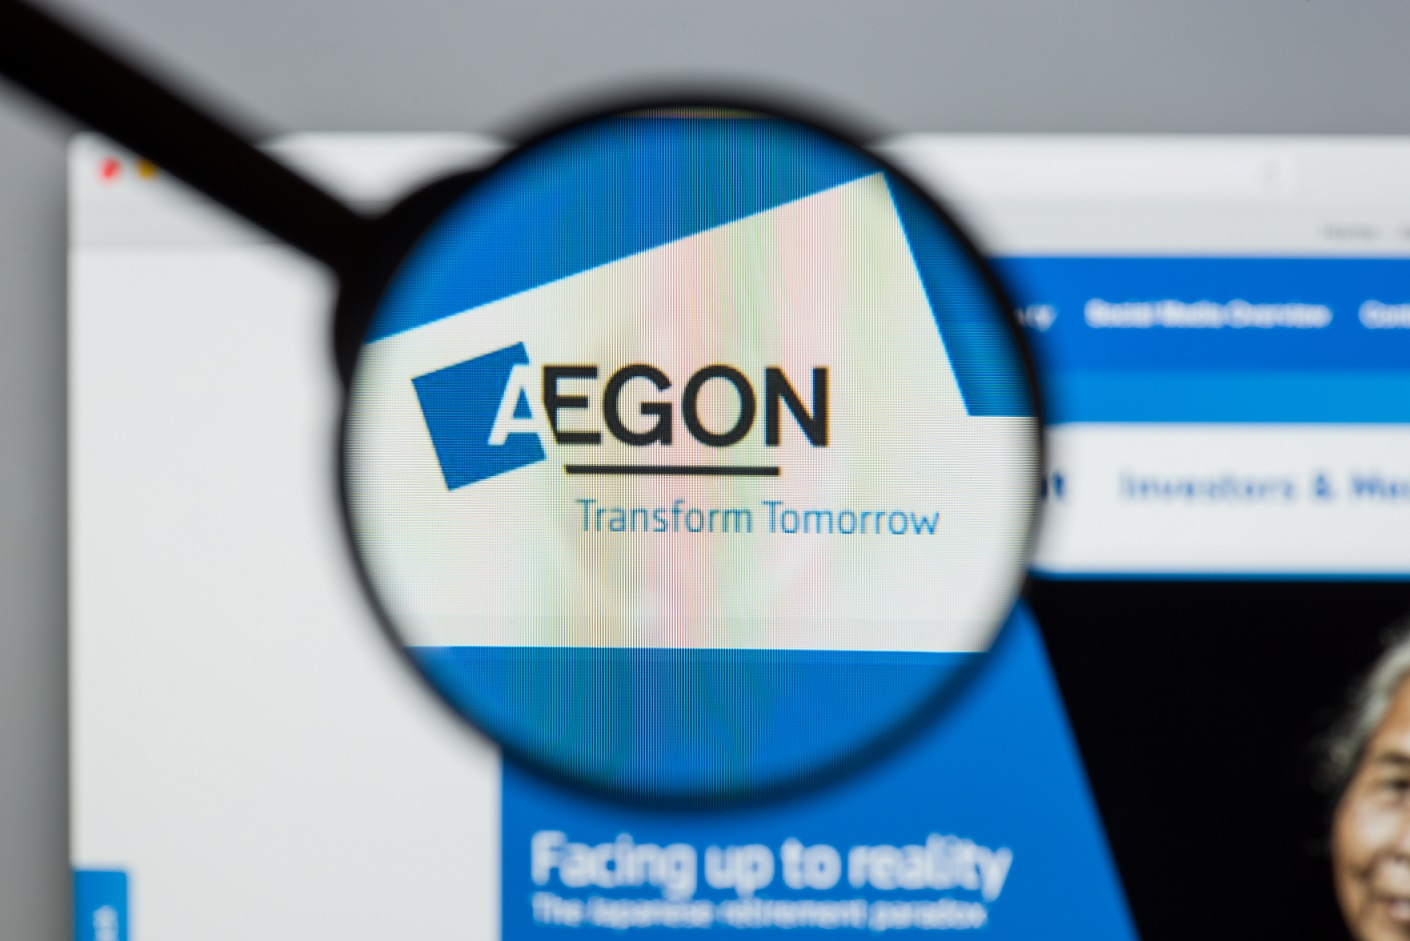 Aegon Transform Tomorrow